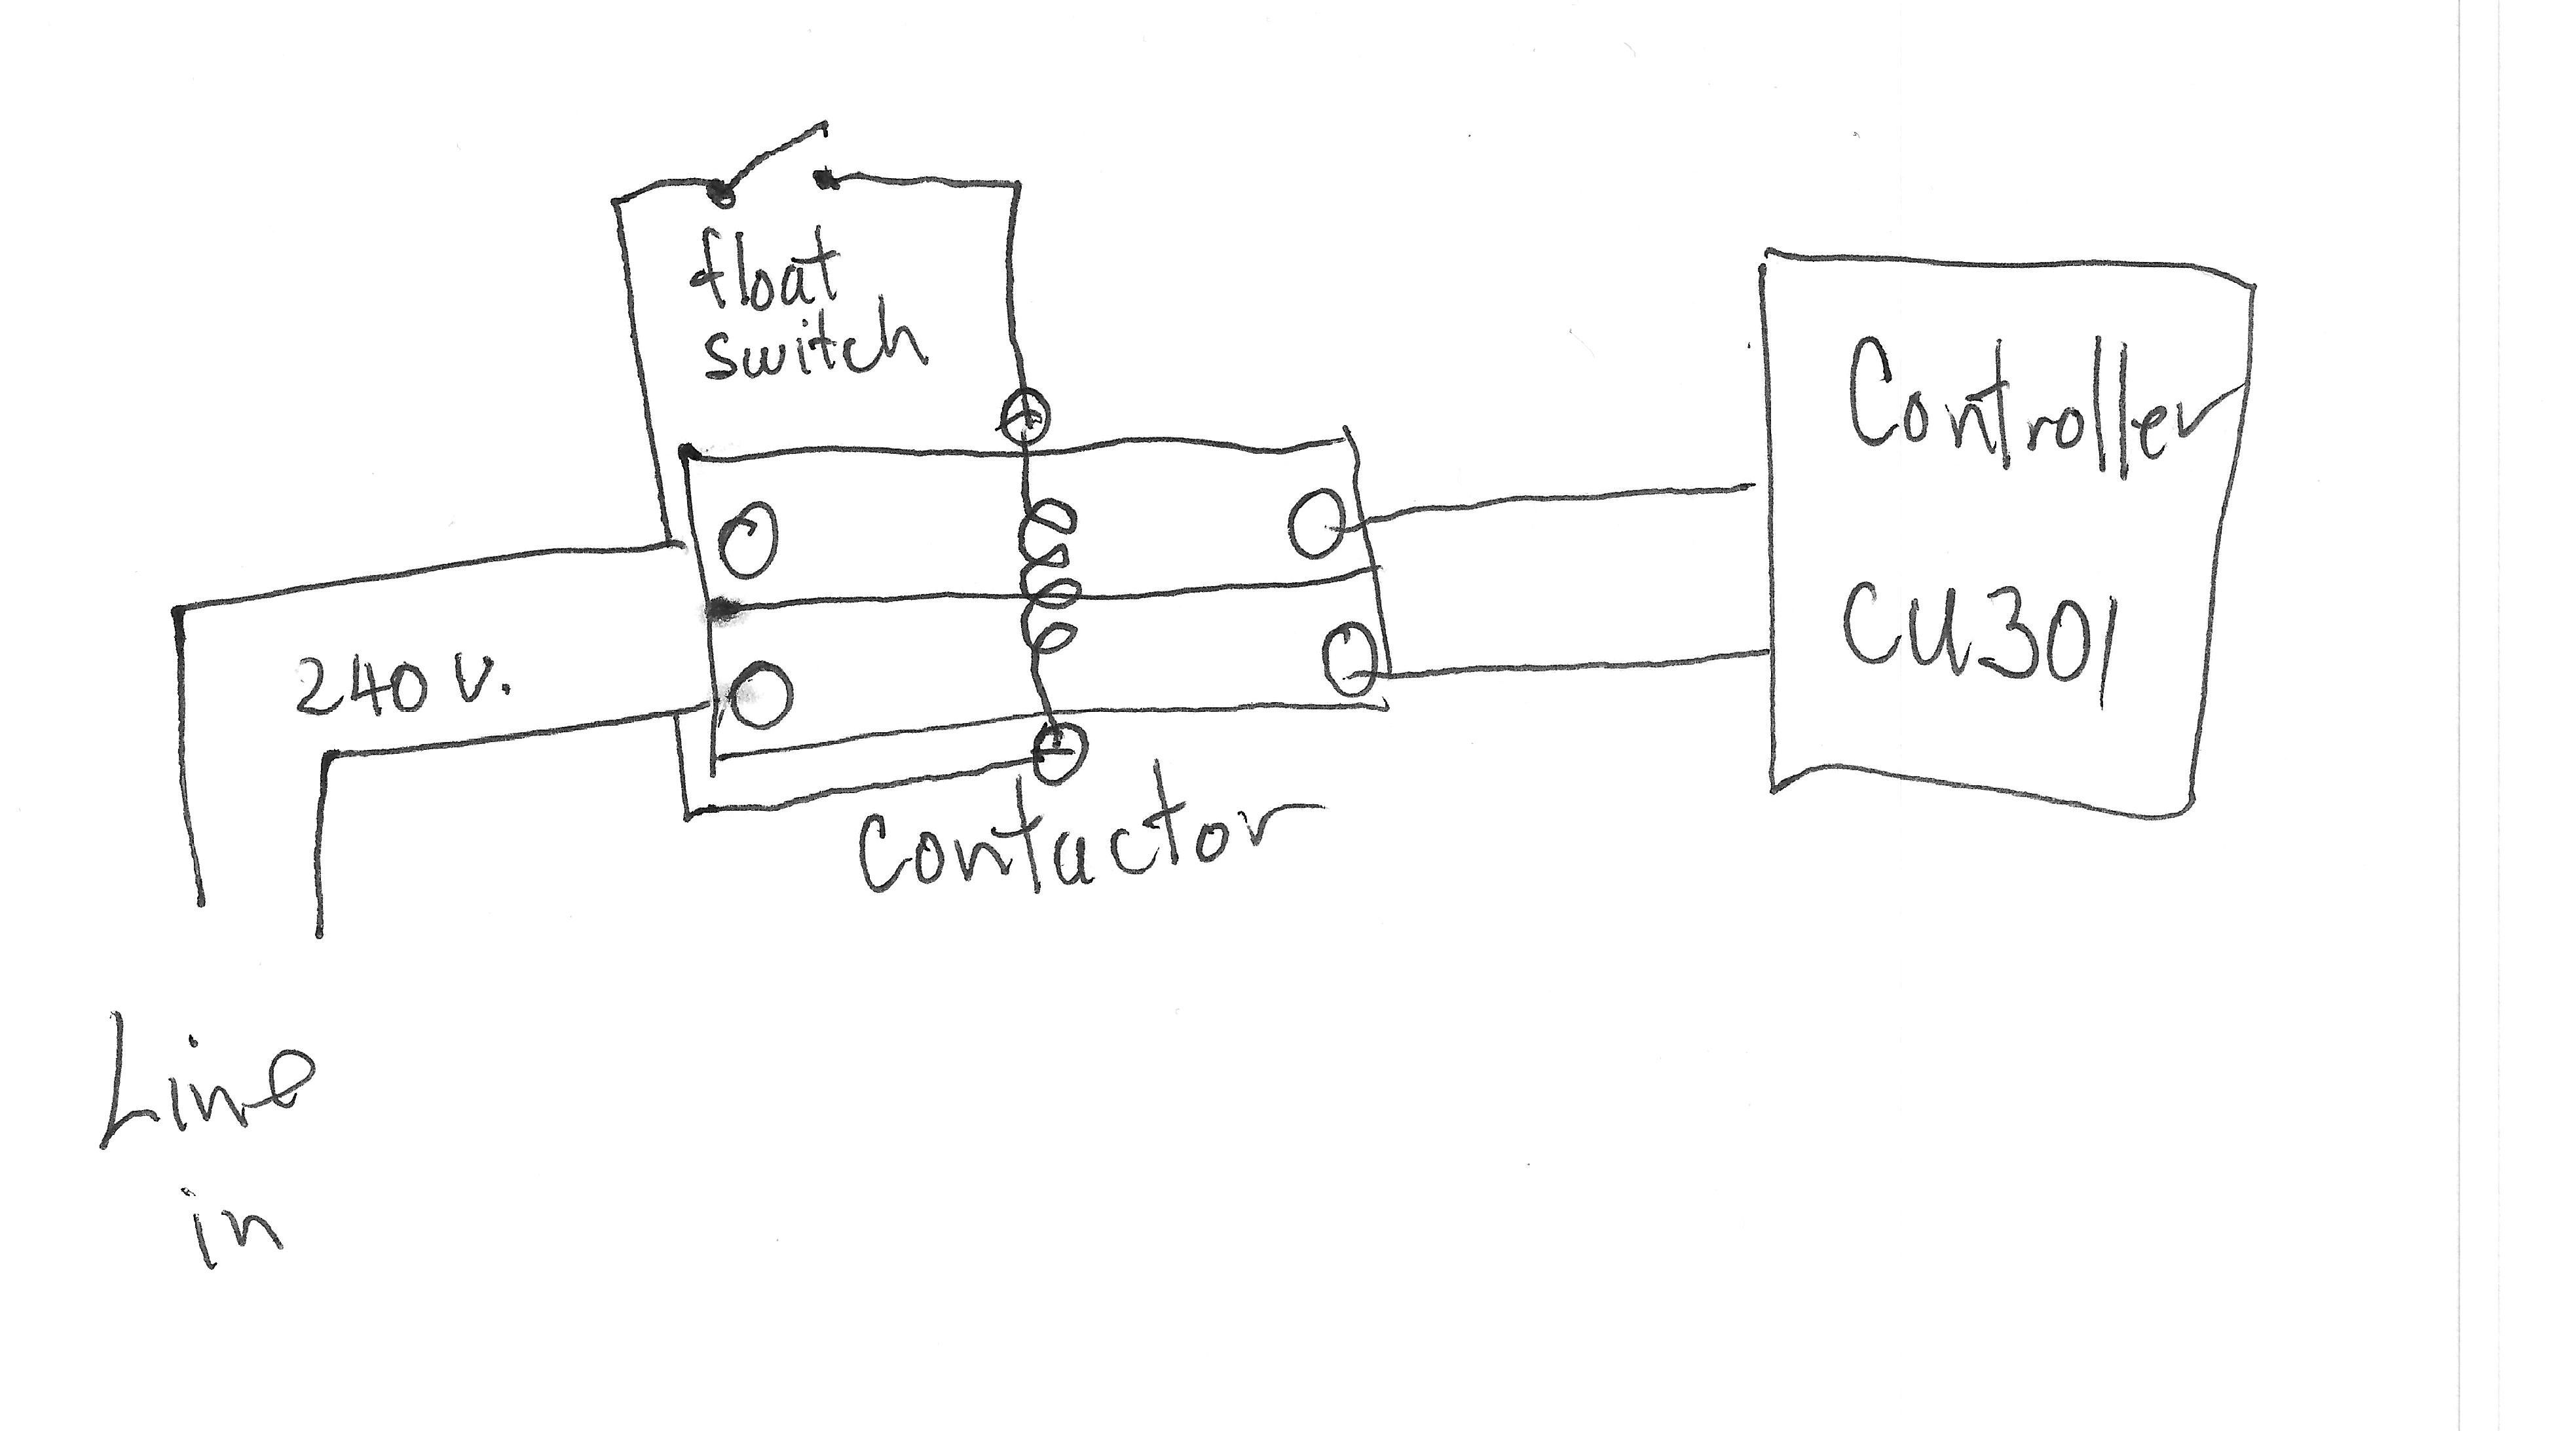 Float Switch Wiring Diagram